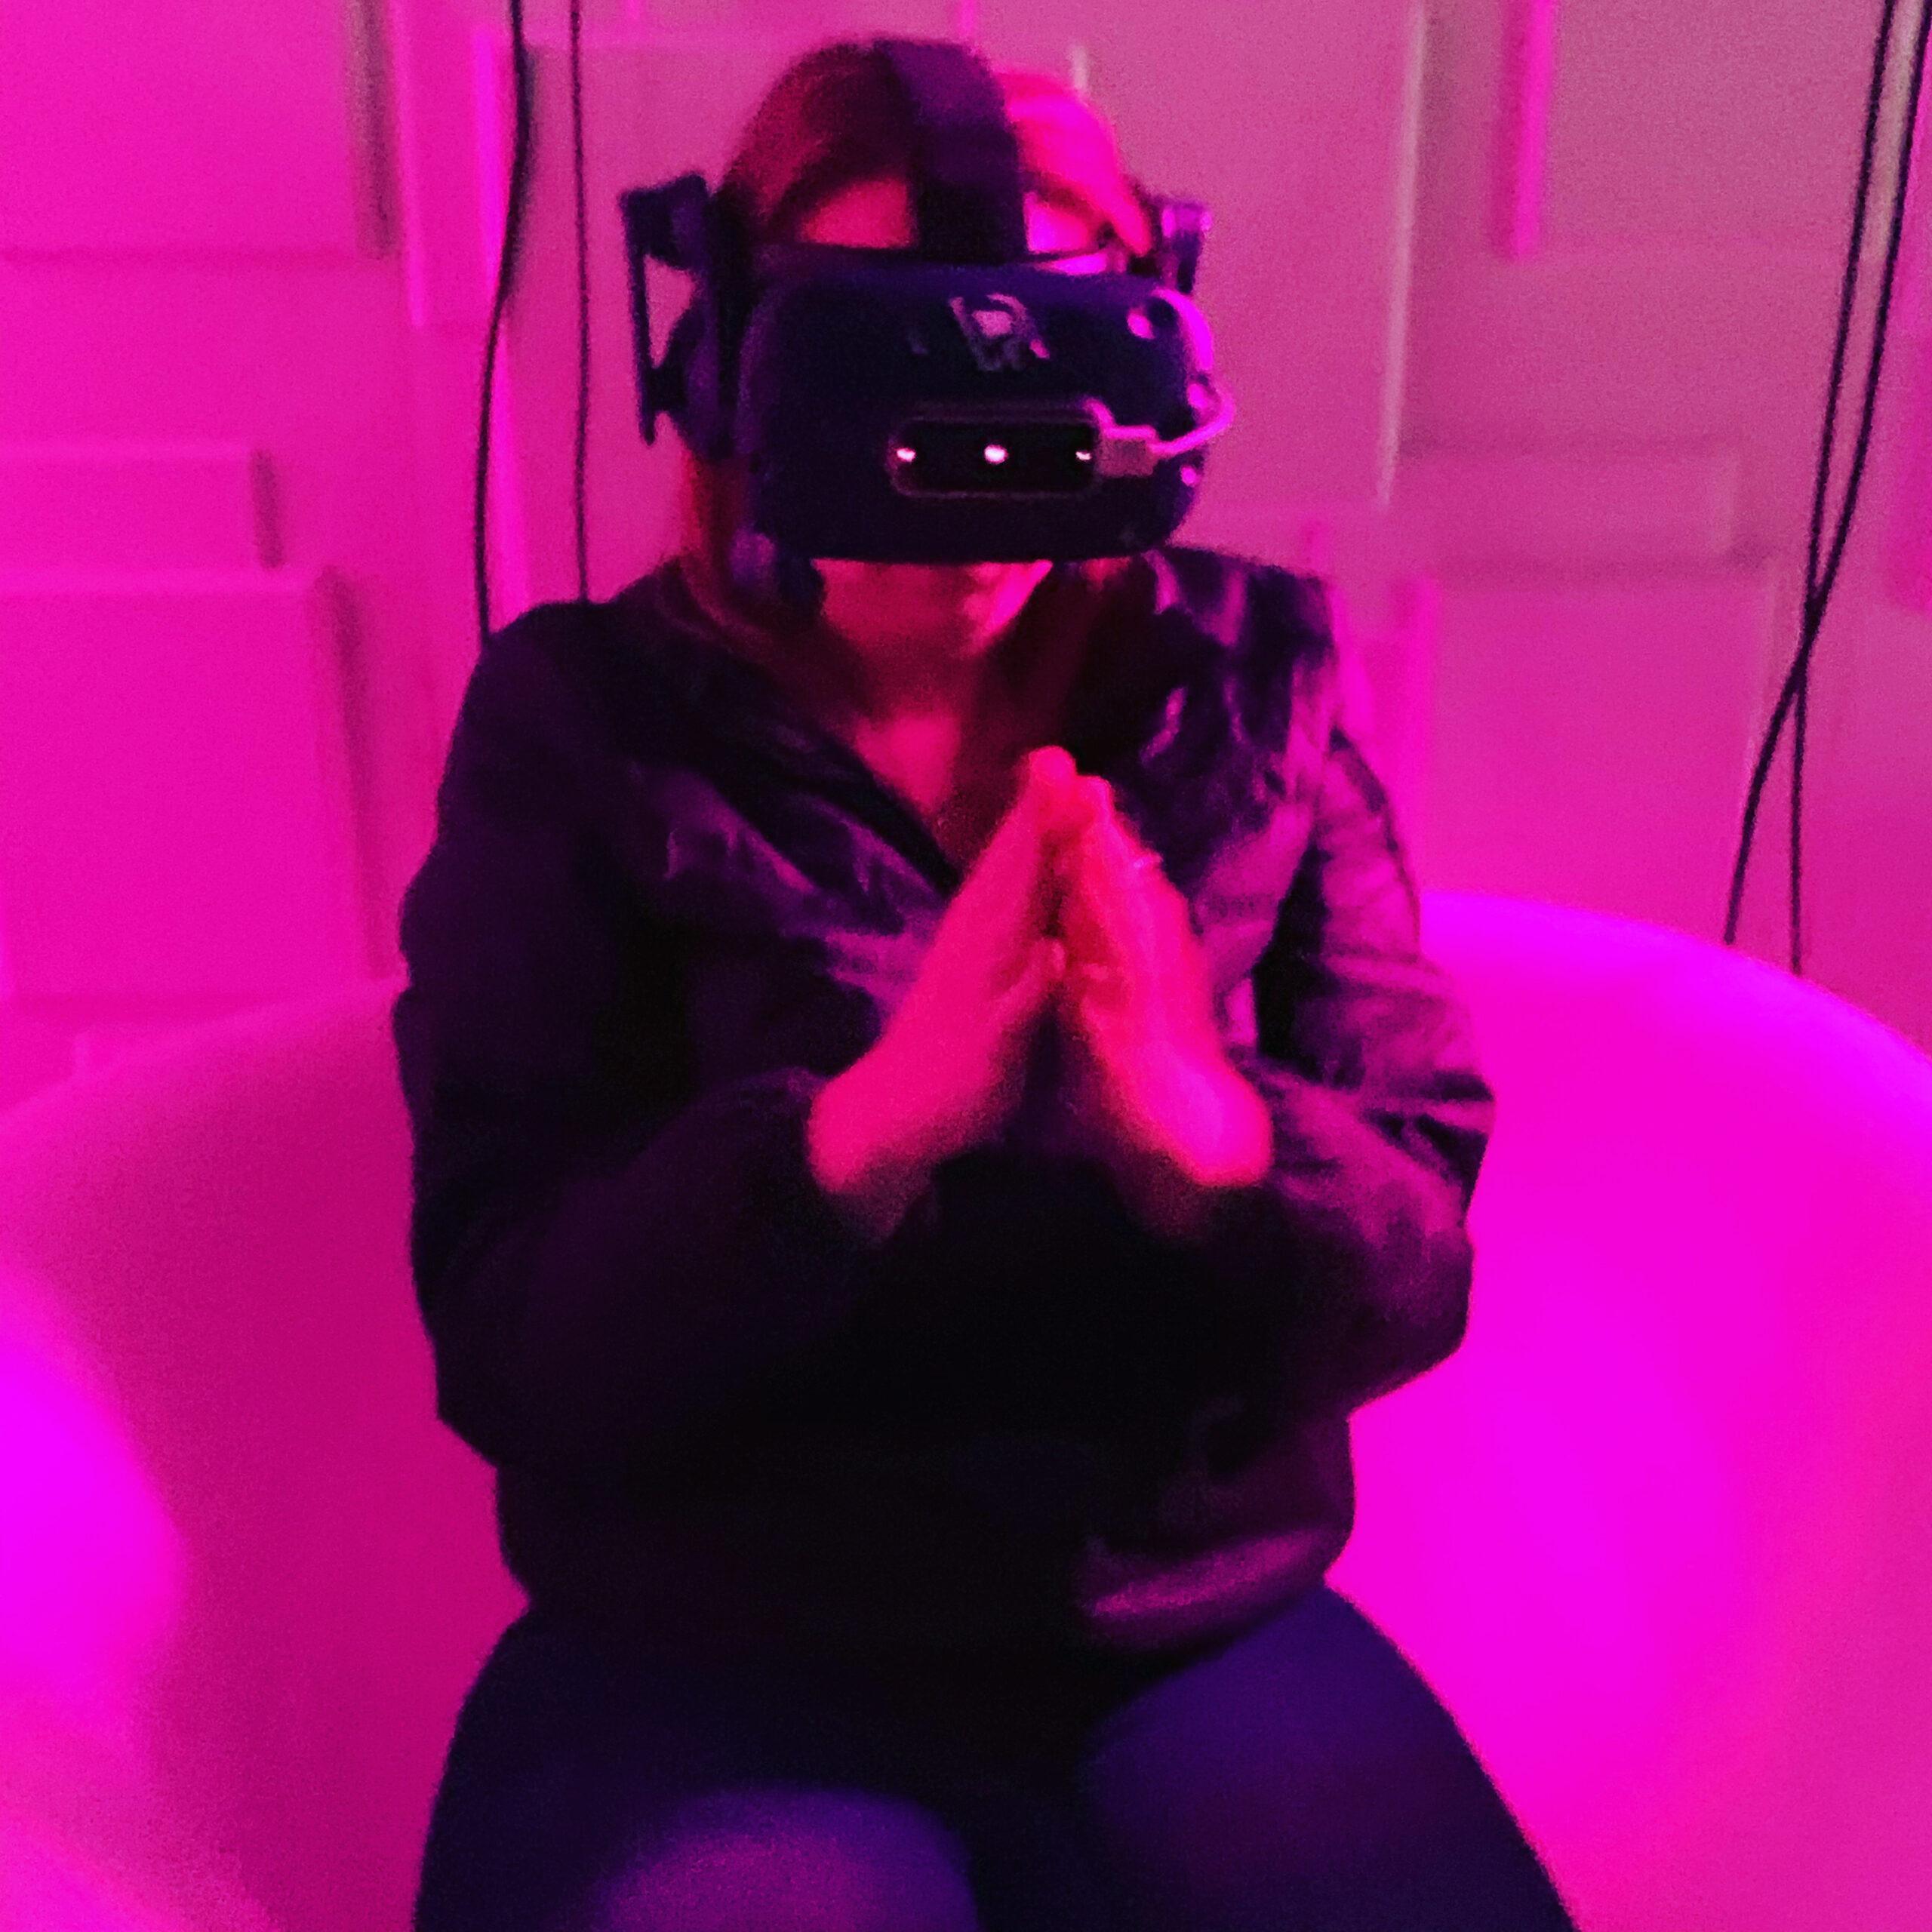 Playing VR